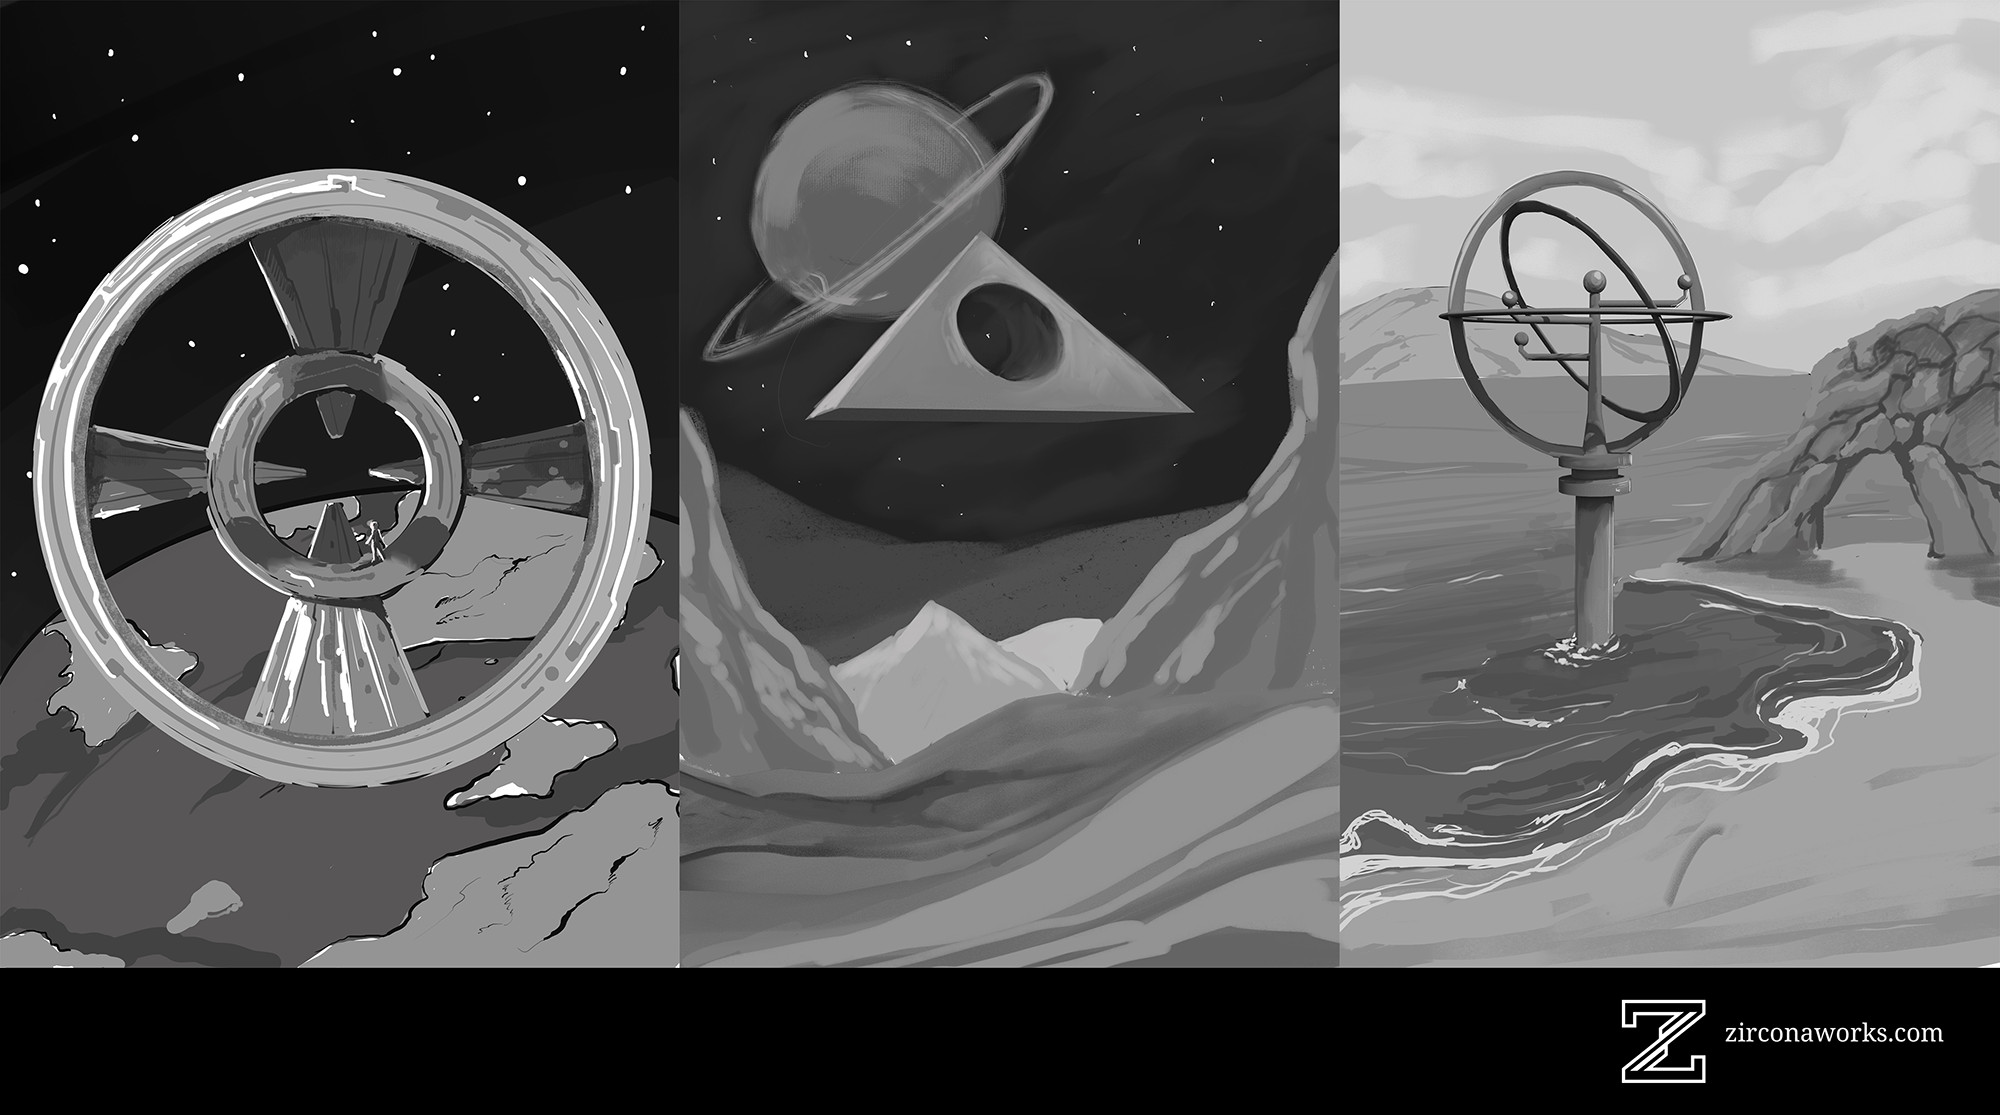 Subject thumbnails